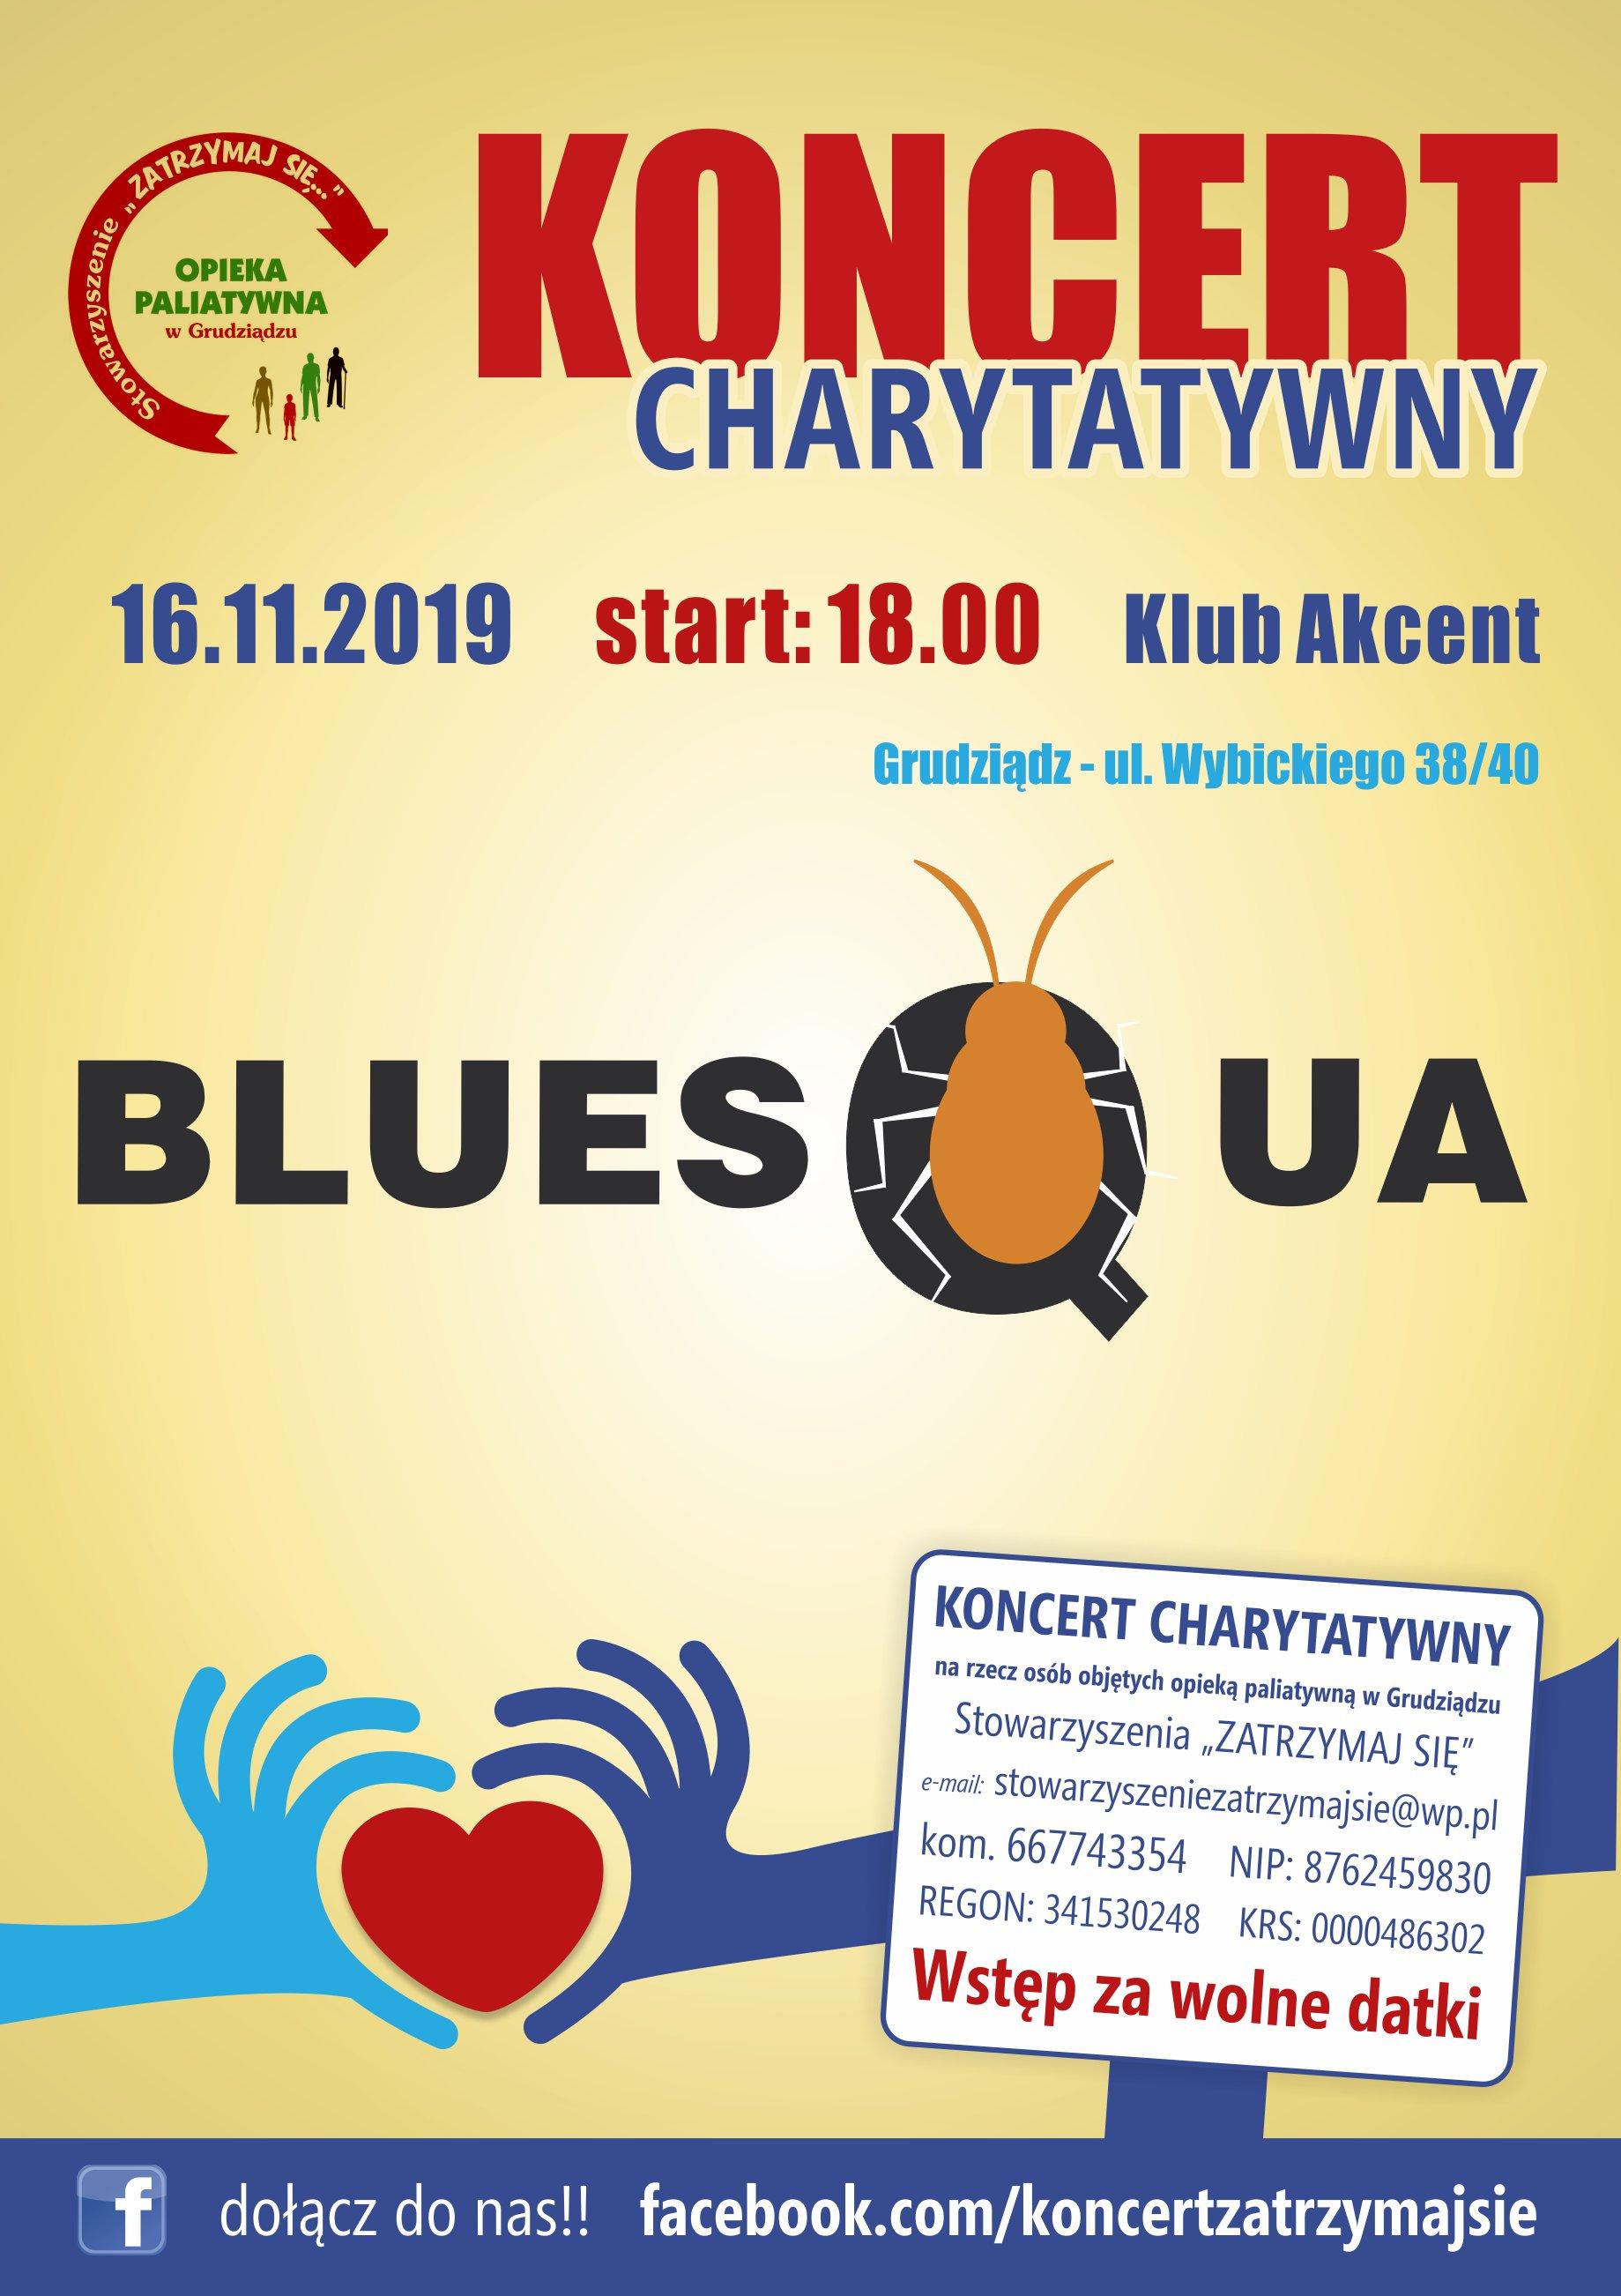 koncert charytatywny Bluesqua (2)